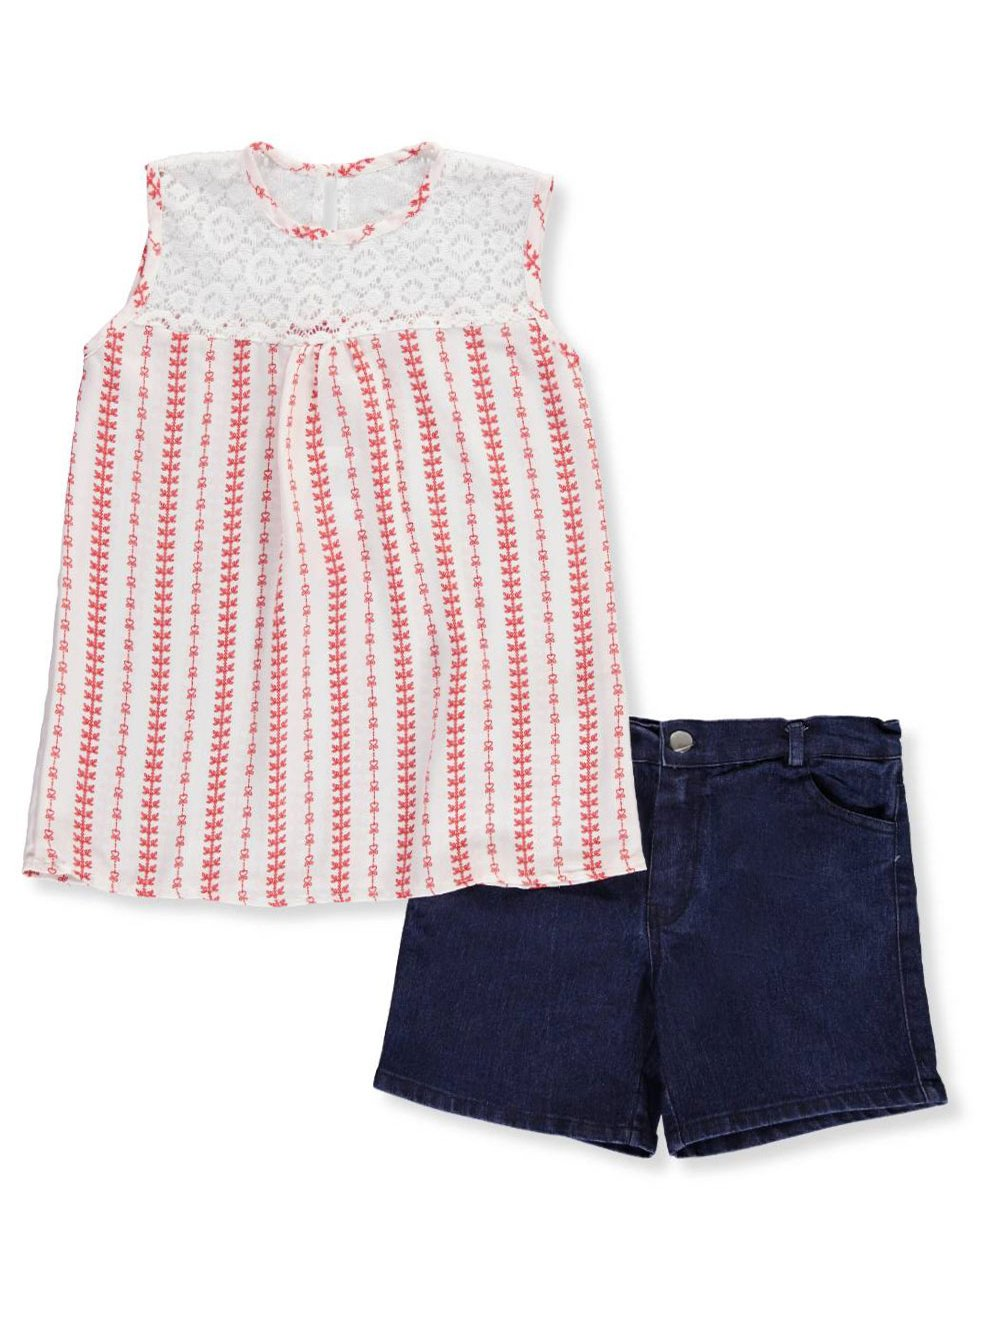 Girls Luv Pink Big Big Girls' 2-Piece Short Set Outfit - red/Multi, 14-16